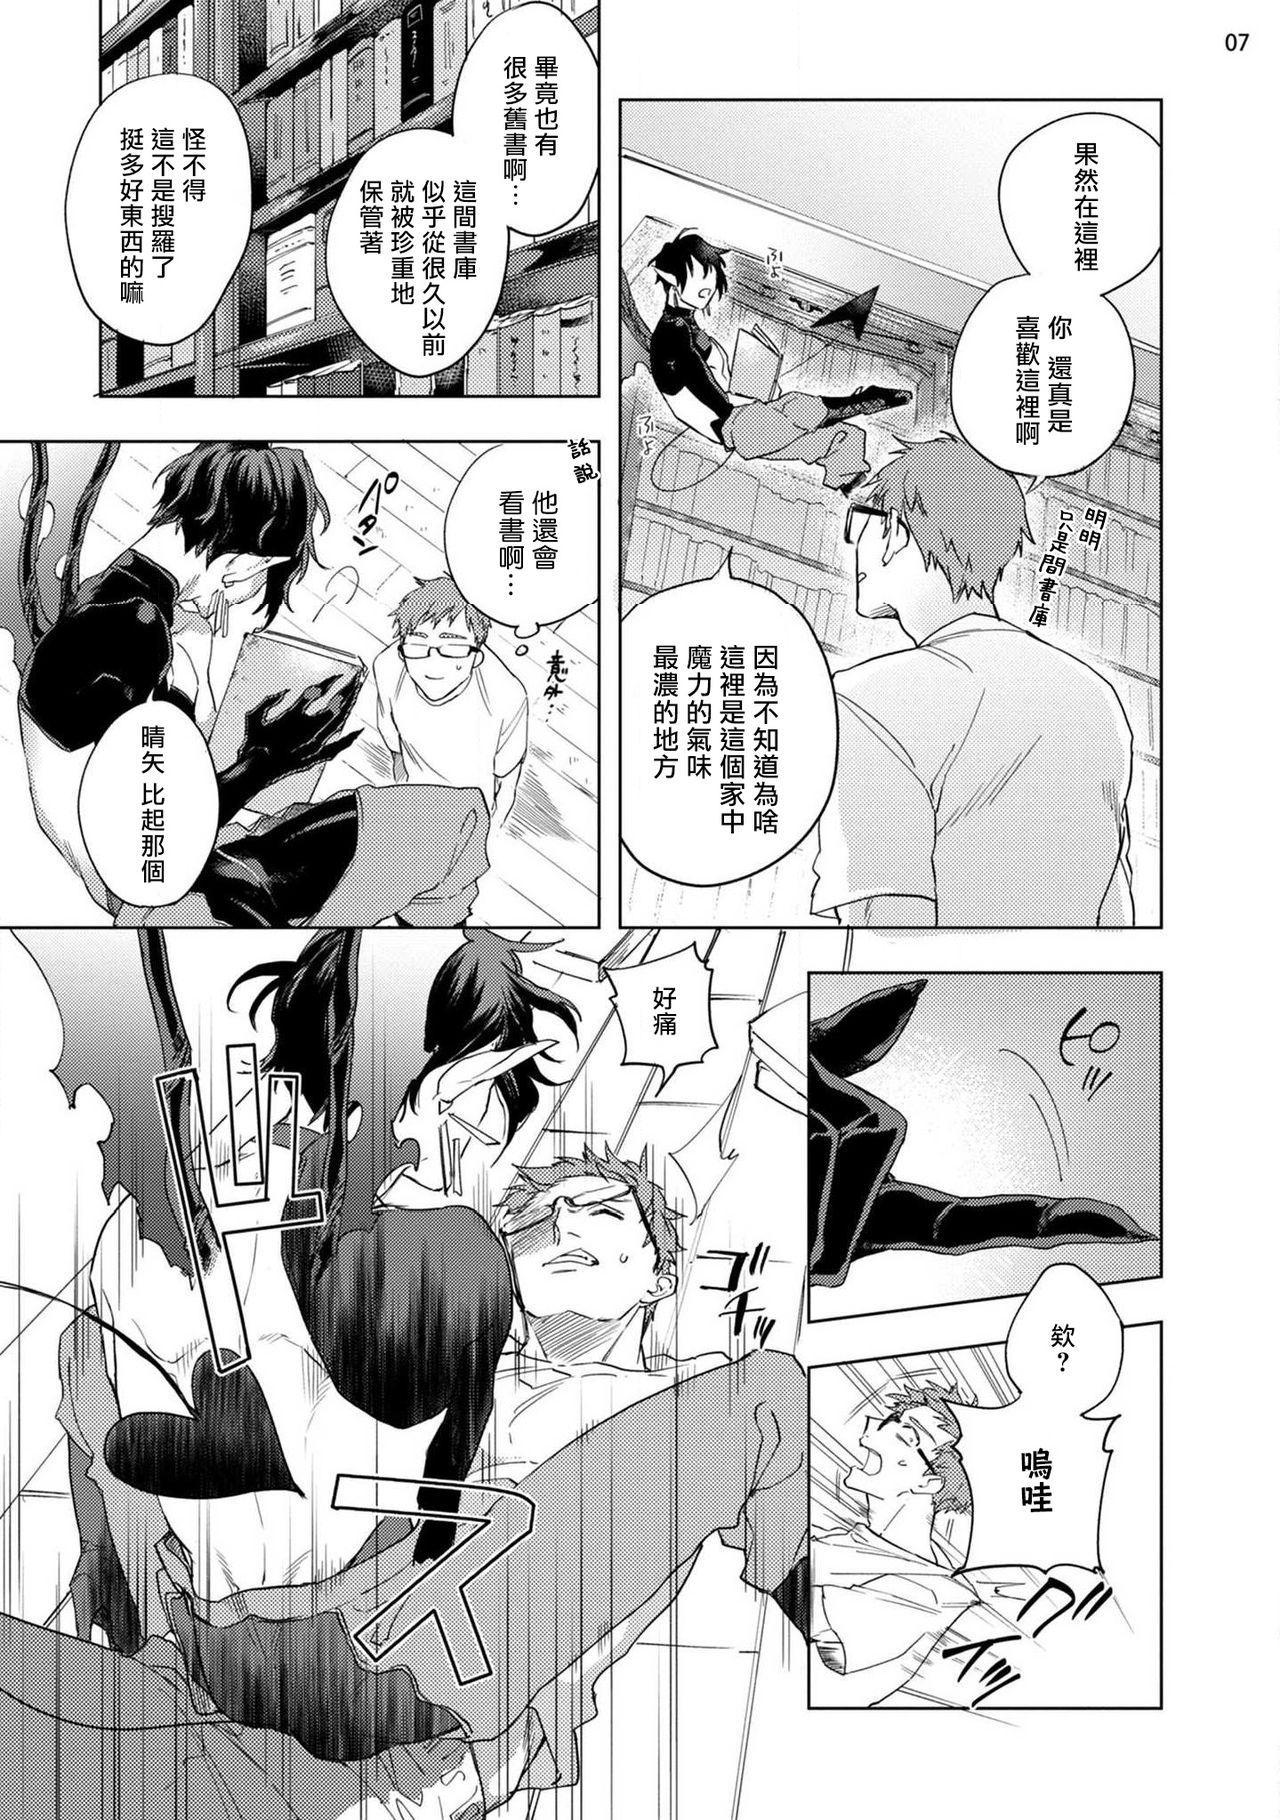 [Yao] Inma-sama ni Hallelujah!   赞美淫魔大人! Ch. 1-3 [Chinese] [拾荒者汉化组] [Digital] 77